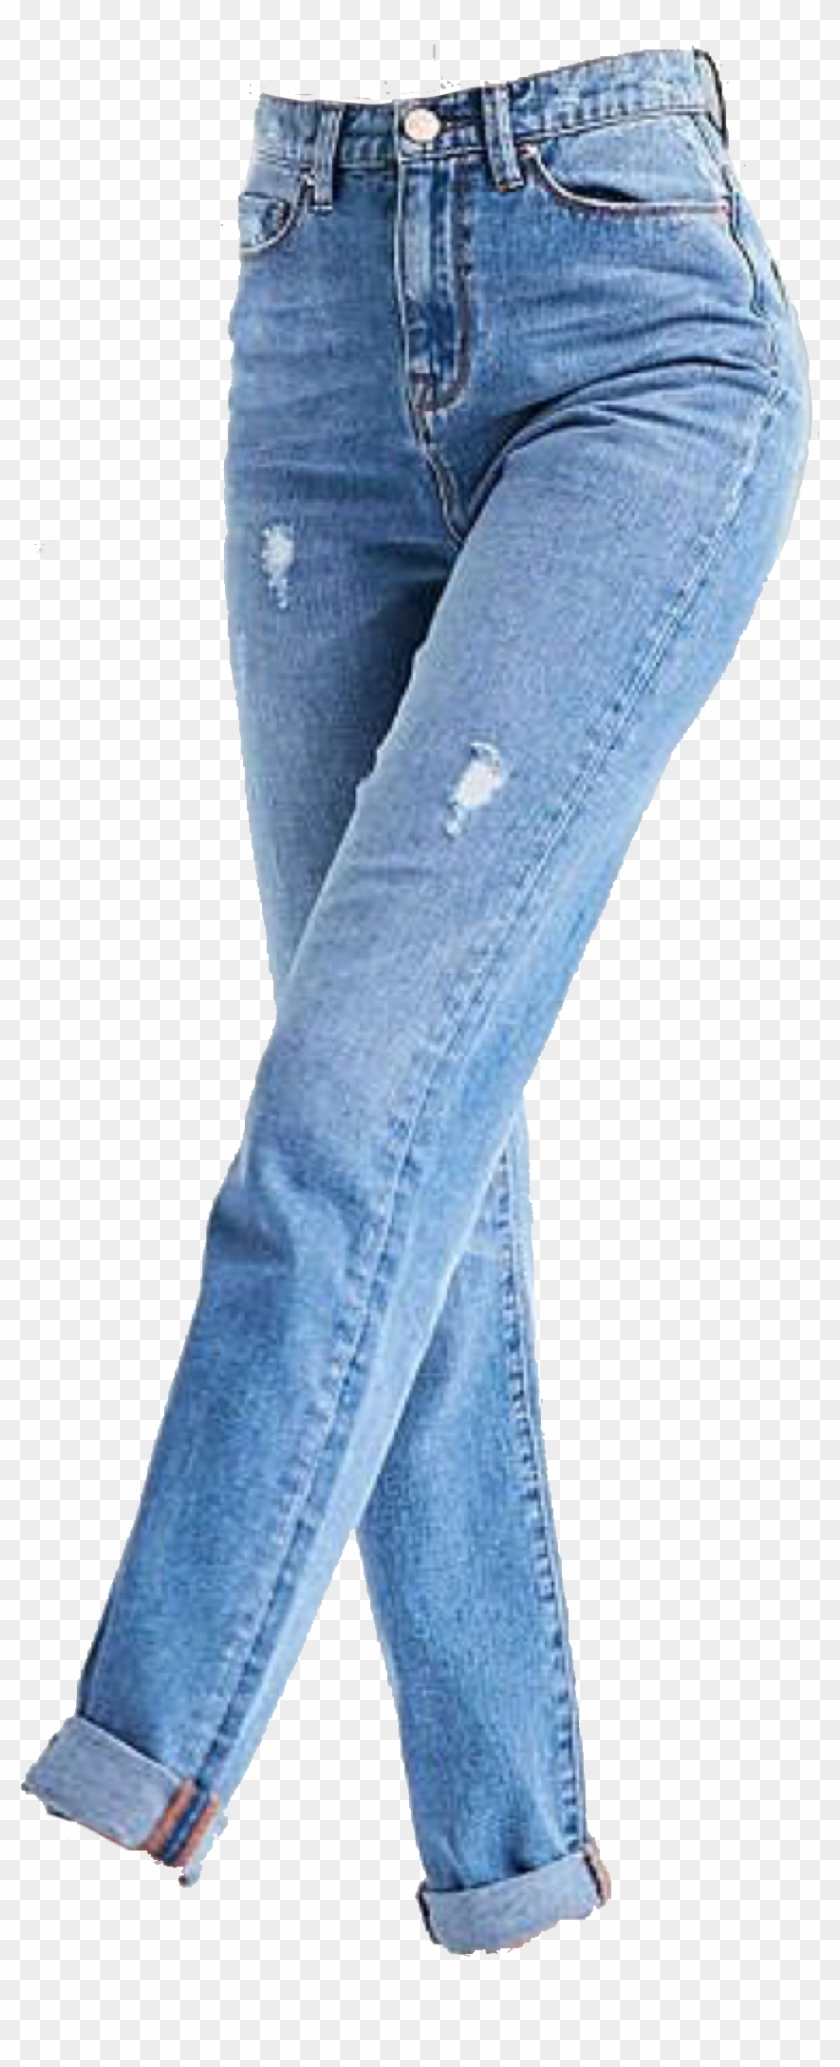 Skinny Jeans Skinny Fit Jeans Super Skinny Jeans Transparent Niche Meme Png Png Download 904x2048 3477760 Pngfind